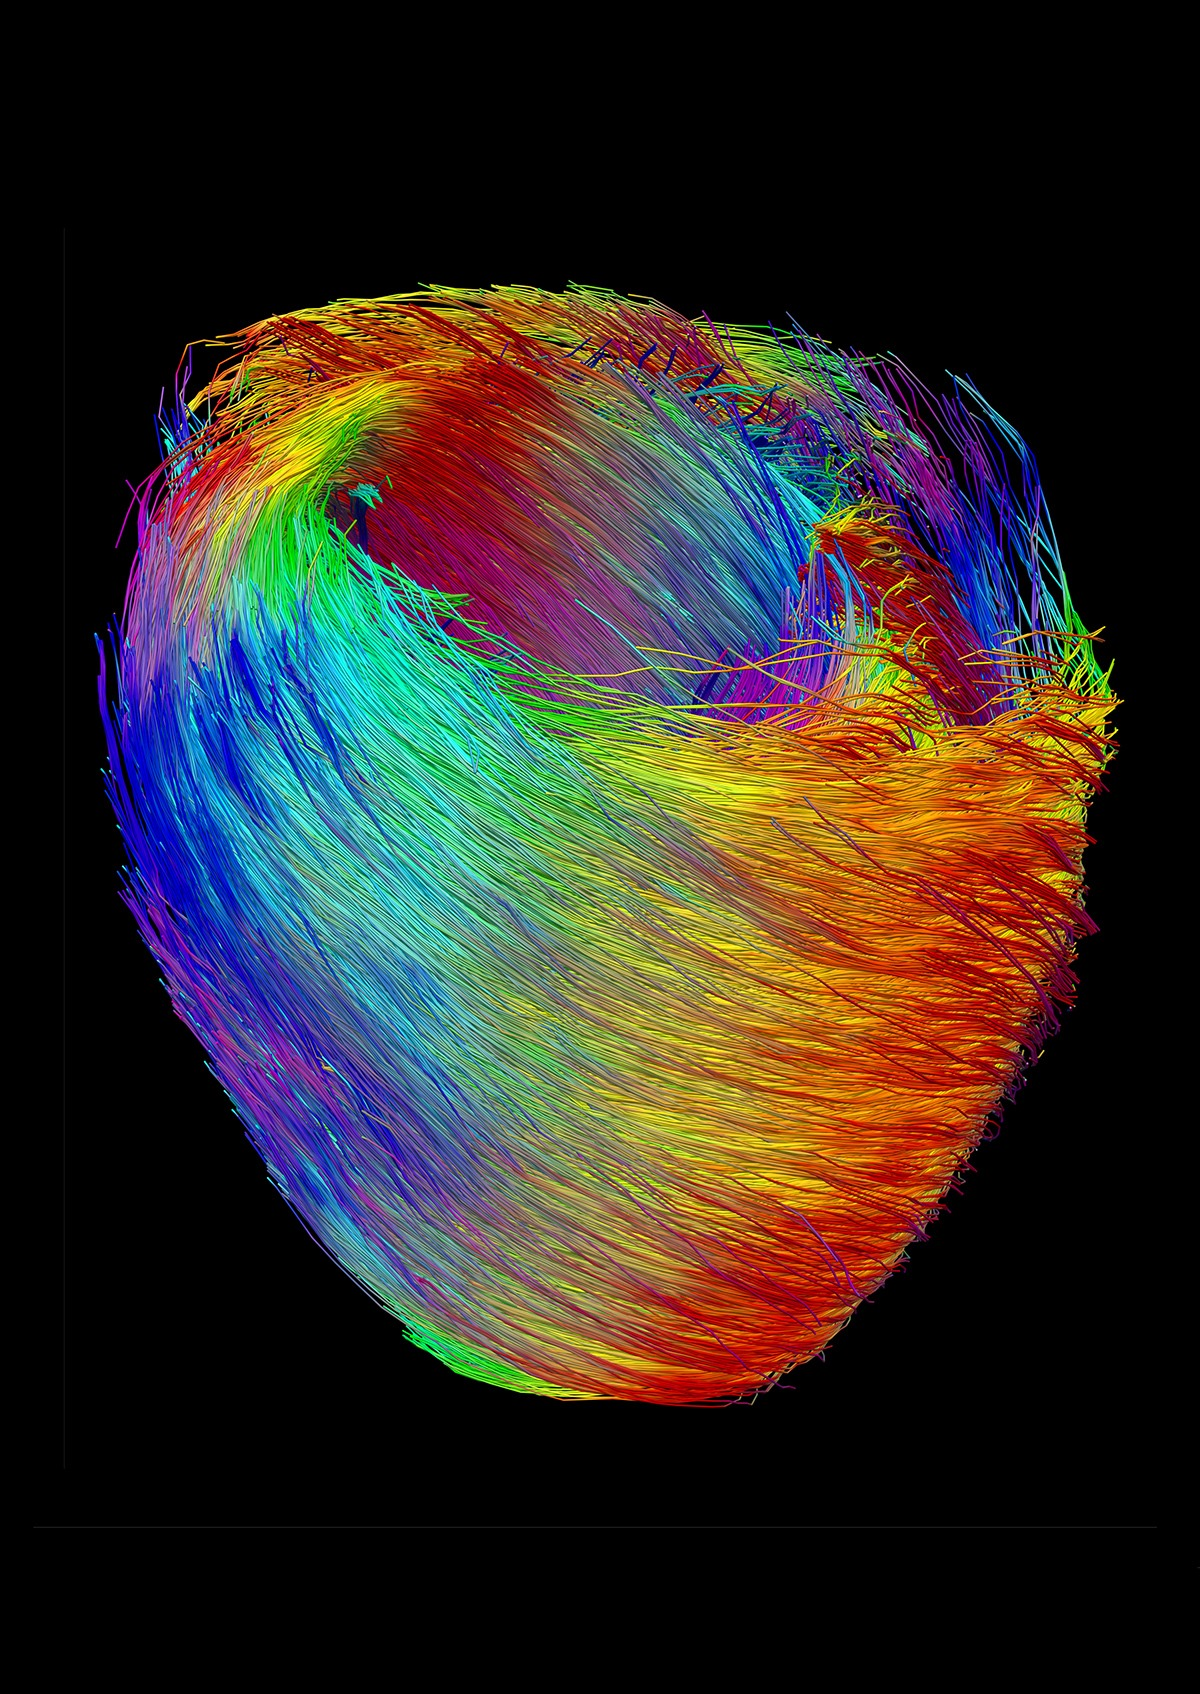 Coeur-souris-IRM-ITD.jpg